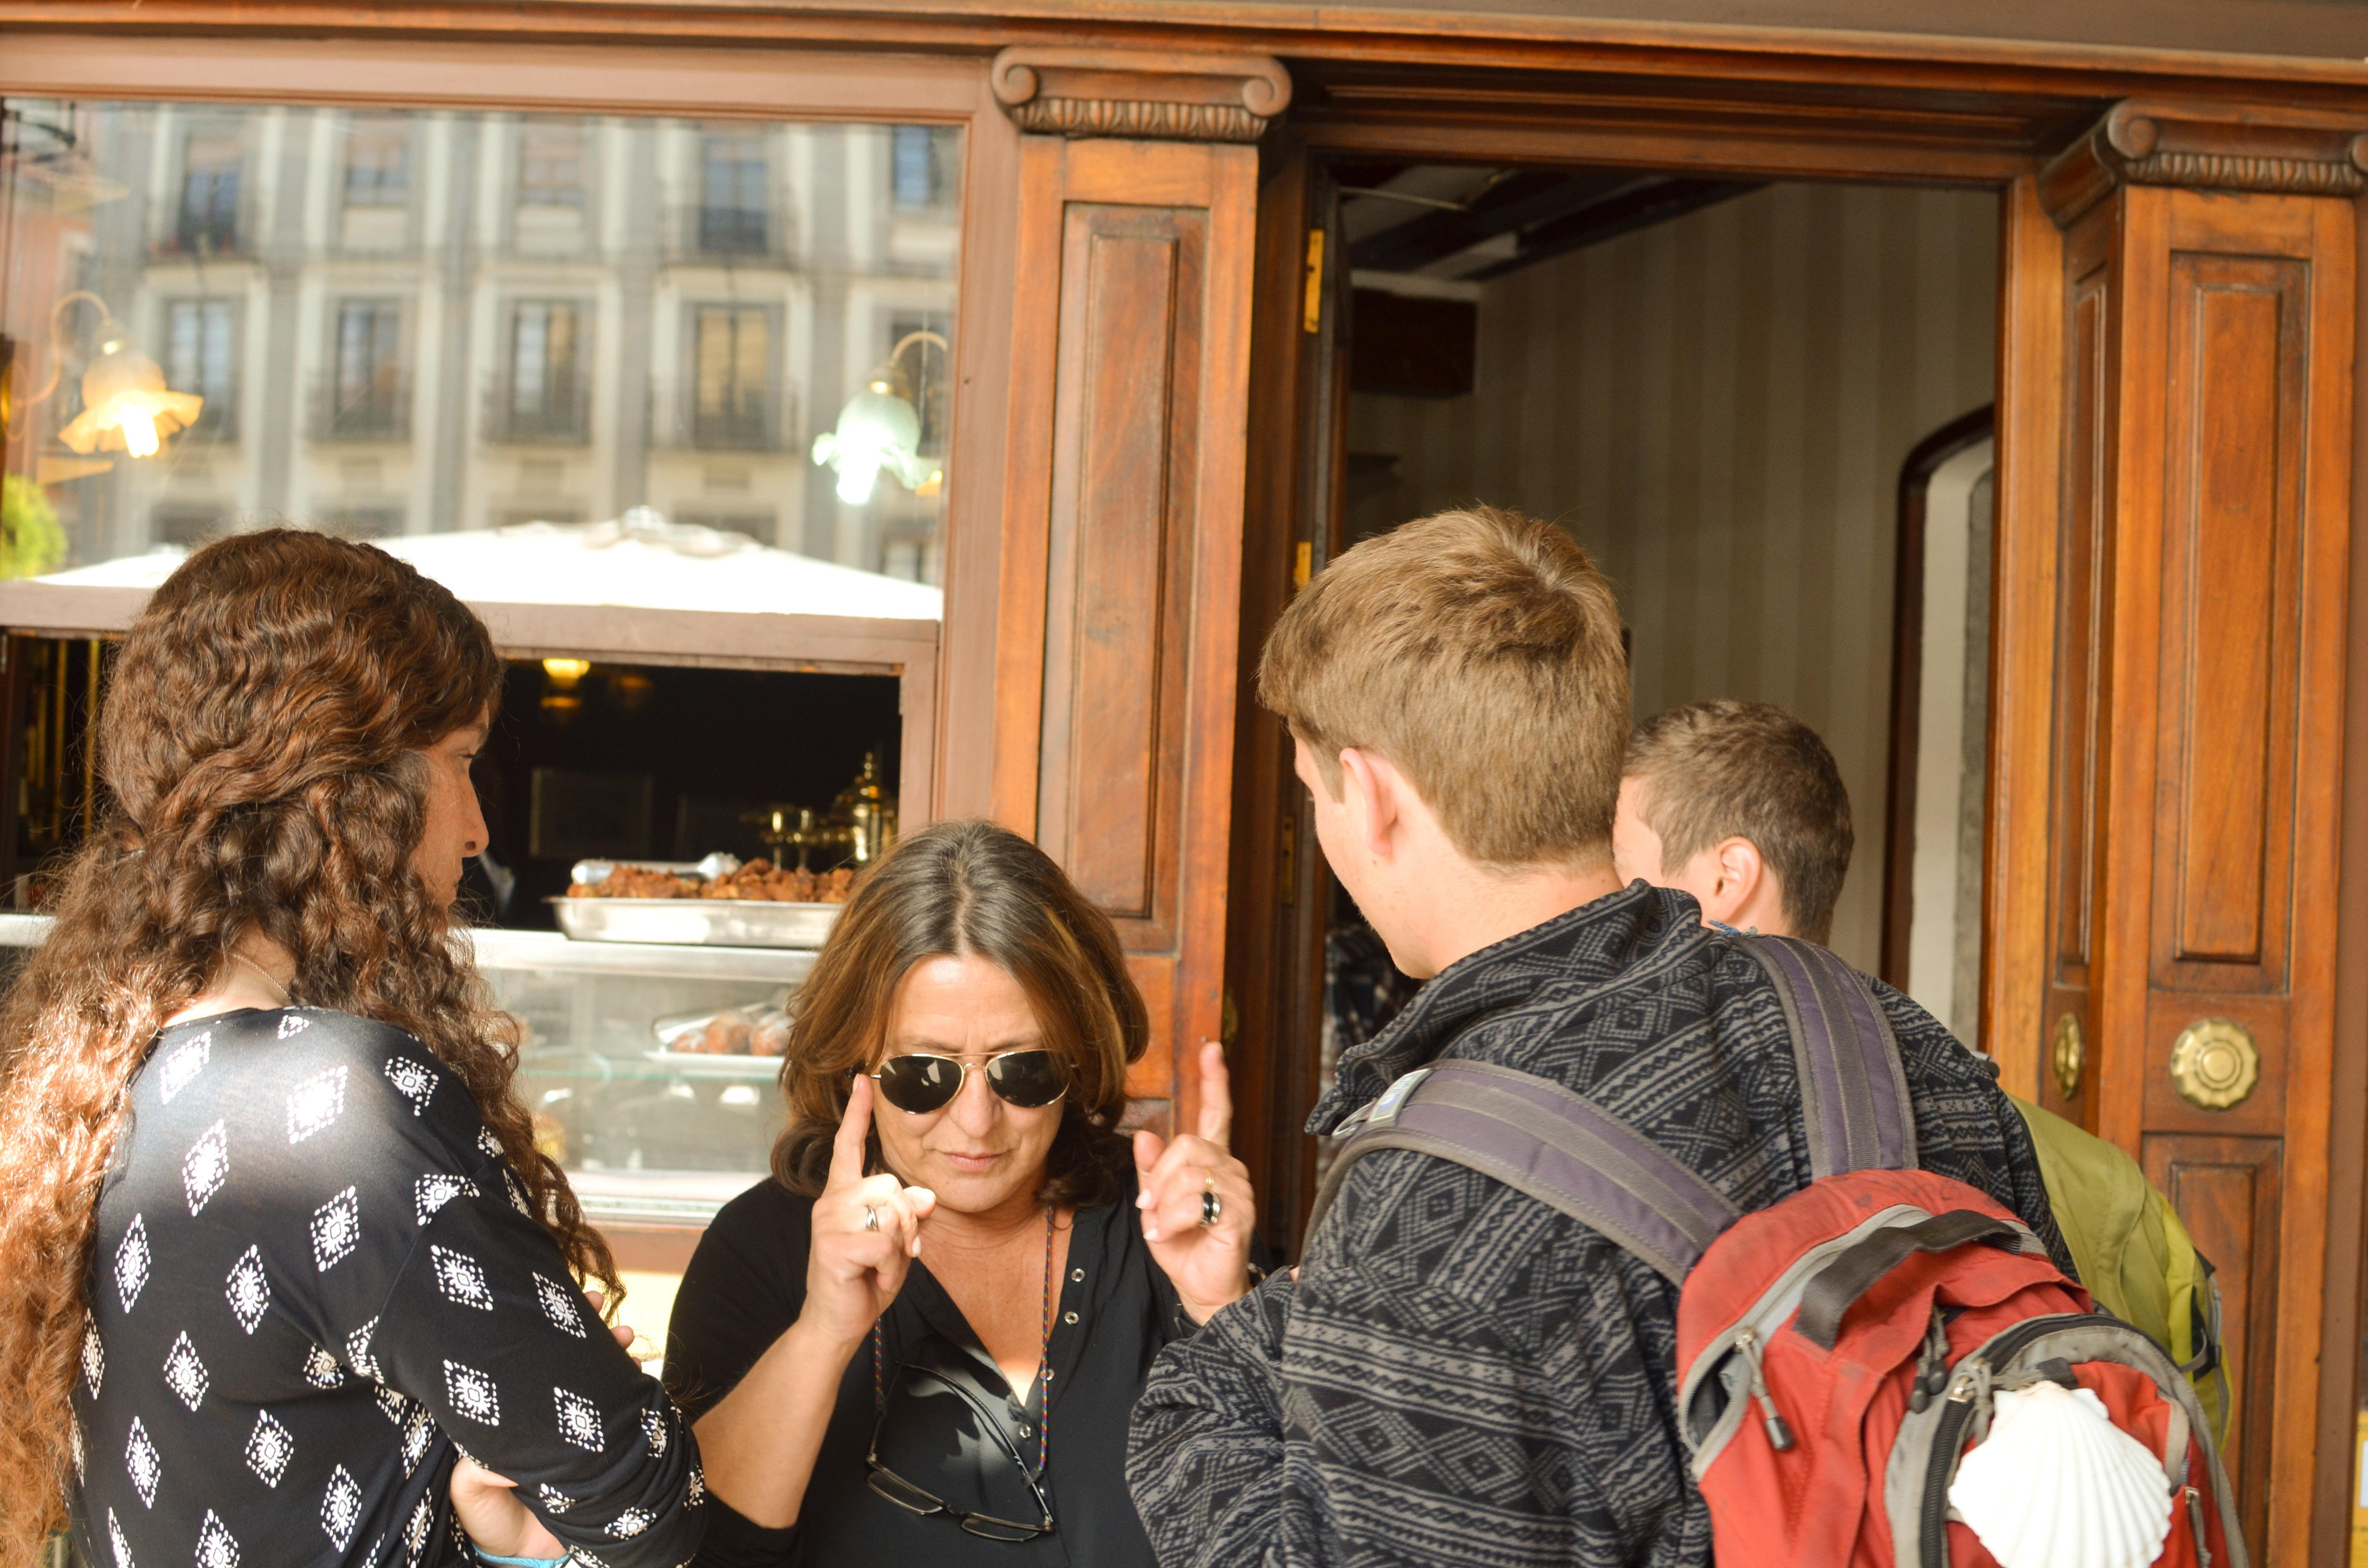 Proctor en Segovia Spanish language immersion